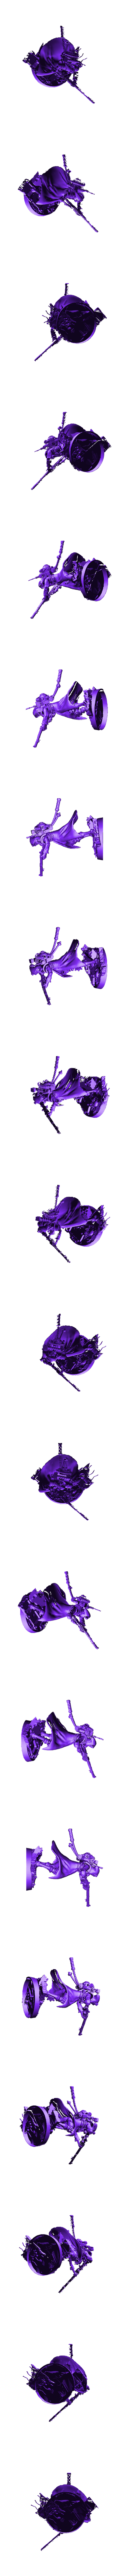 Ranger_4.1_-_Whole_with_Base.stl Download free STL file Martian Mechanized Rangers • 3D printable object, ErikTheHeretek